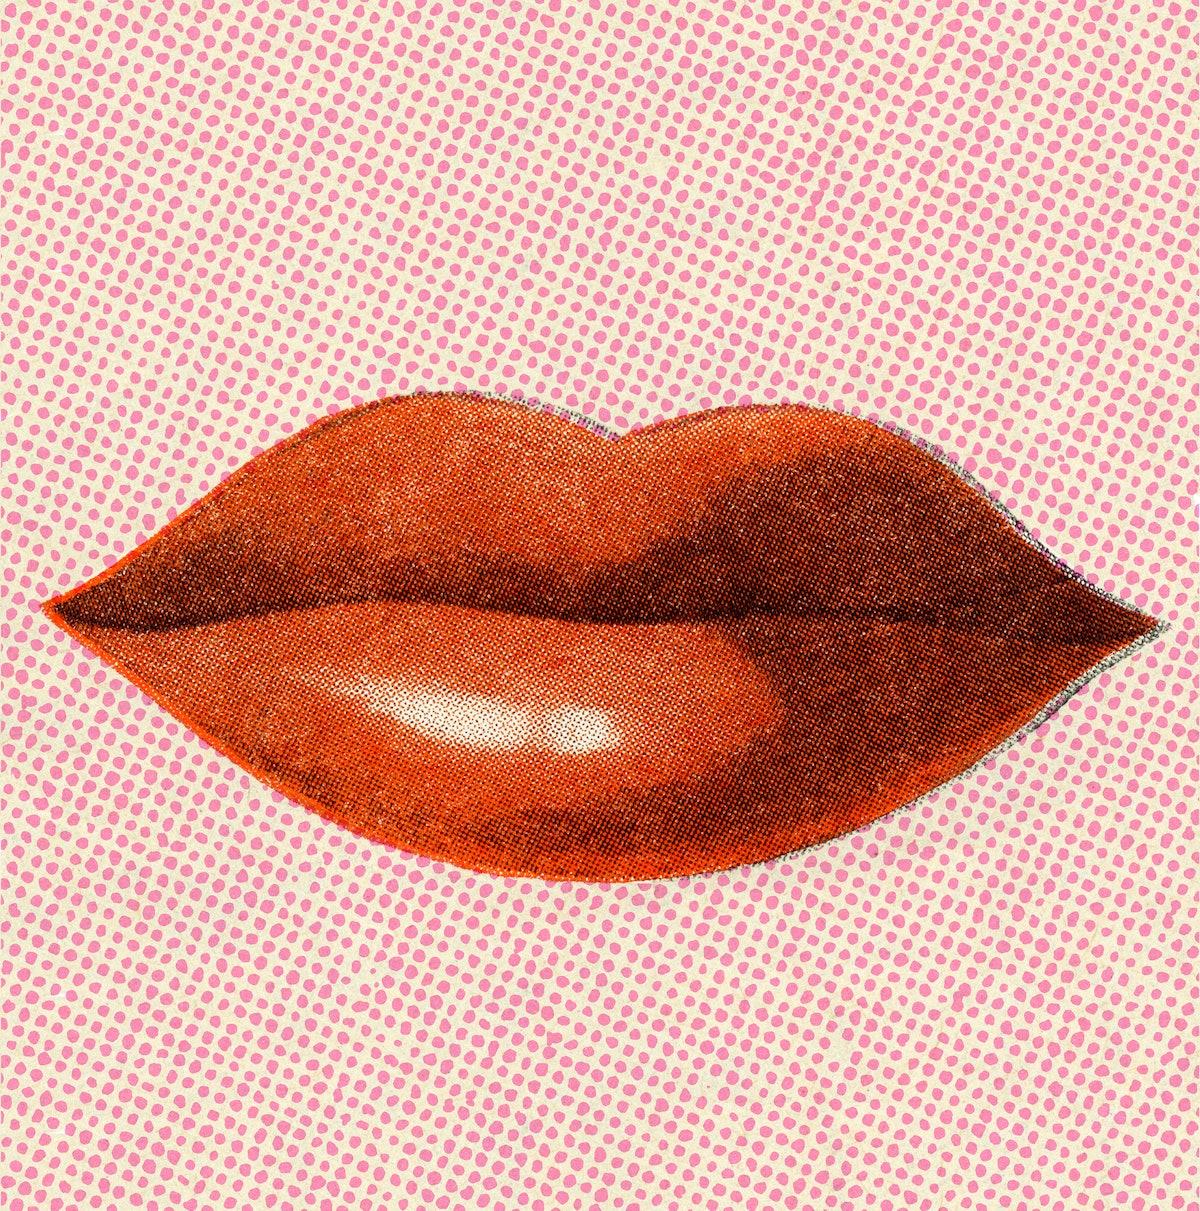 lips illustration